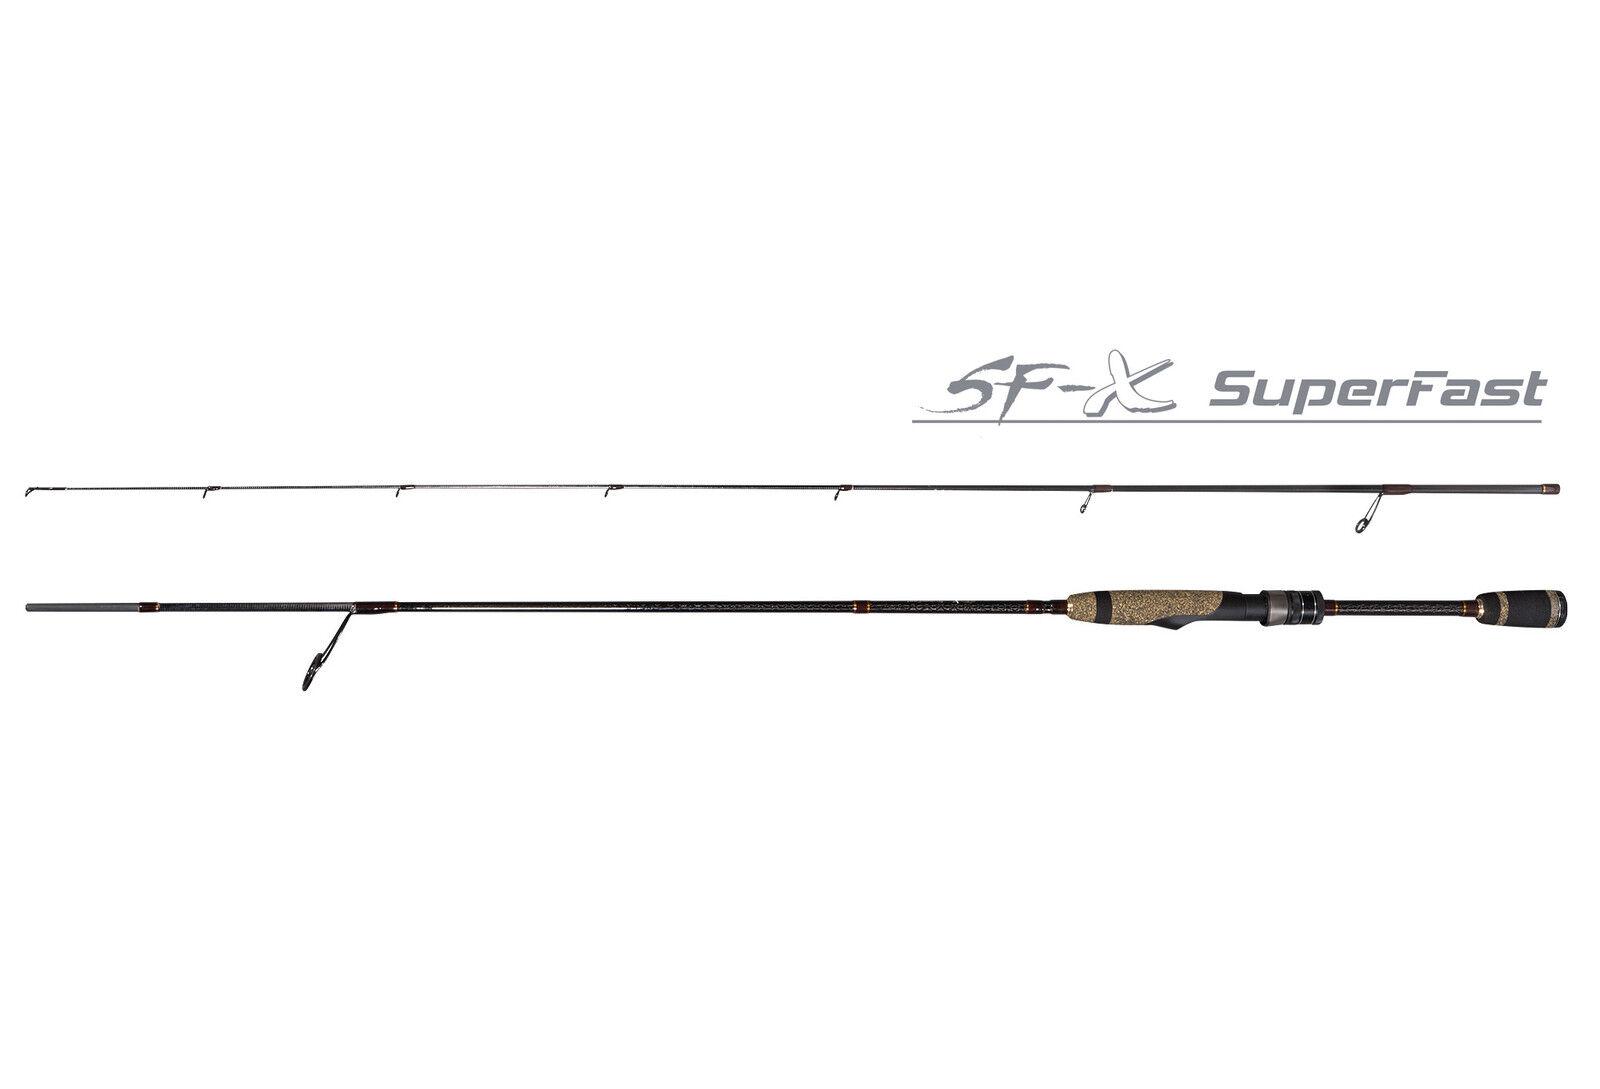 Dragon CXT Spinn SuperFast SF-X 1,90m - 2,13m 2-section Spinning Cañas